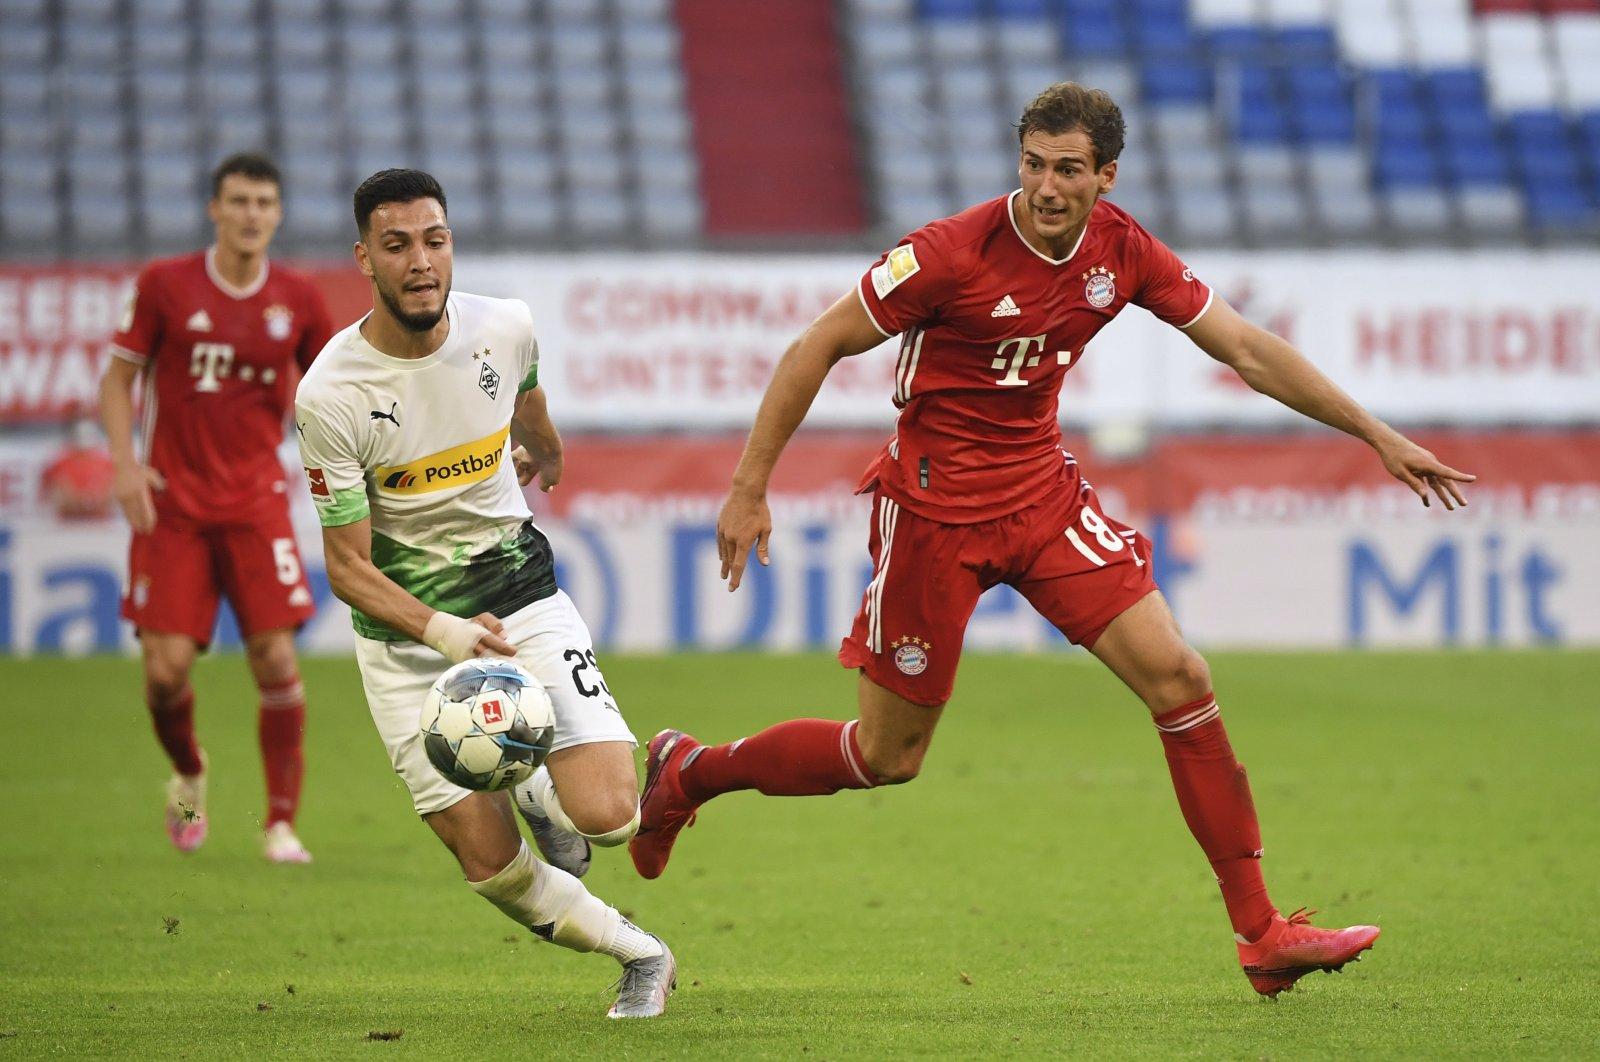 Bayern Munich's Leon Goretzka (R), and Borussia Moenchengladbach's Ramy Bensebaini compete for the ball during a Bundesliga match at the Allianz Arena stadium, in Munich, Germany, June 13, 2020. (AP Photo)